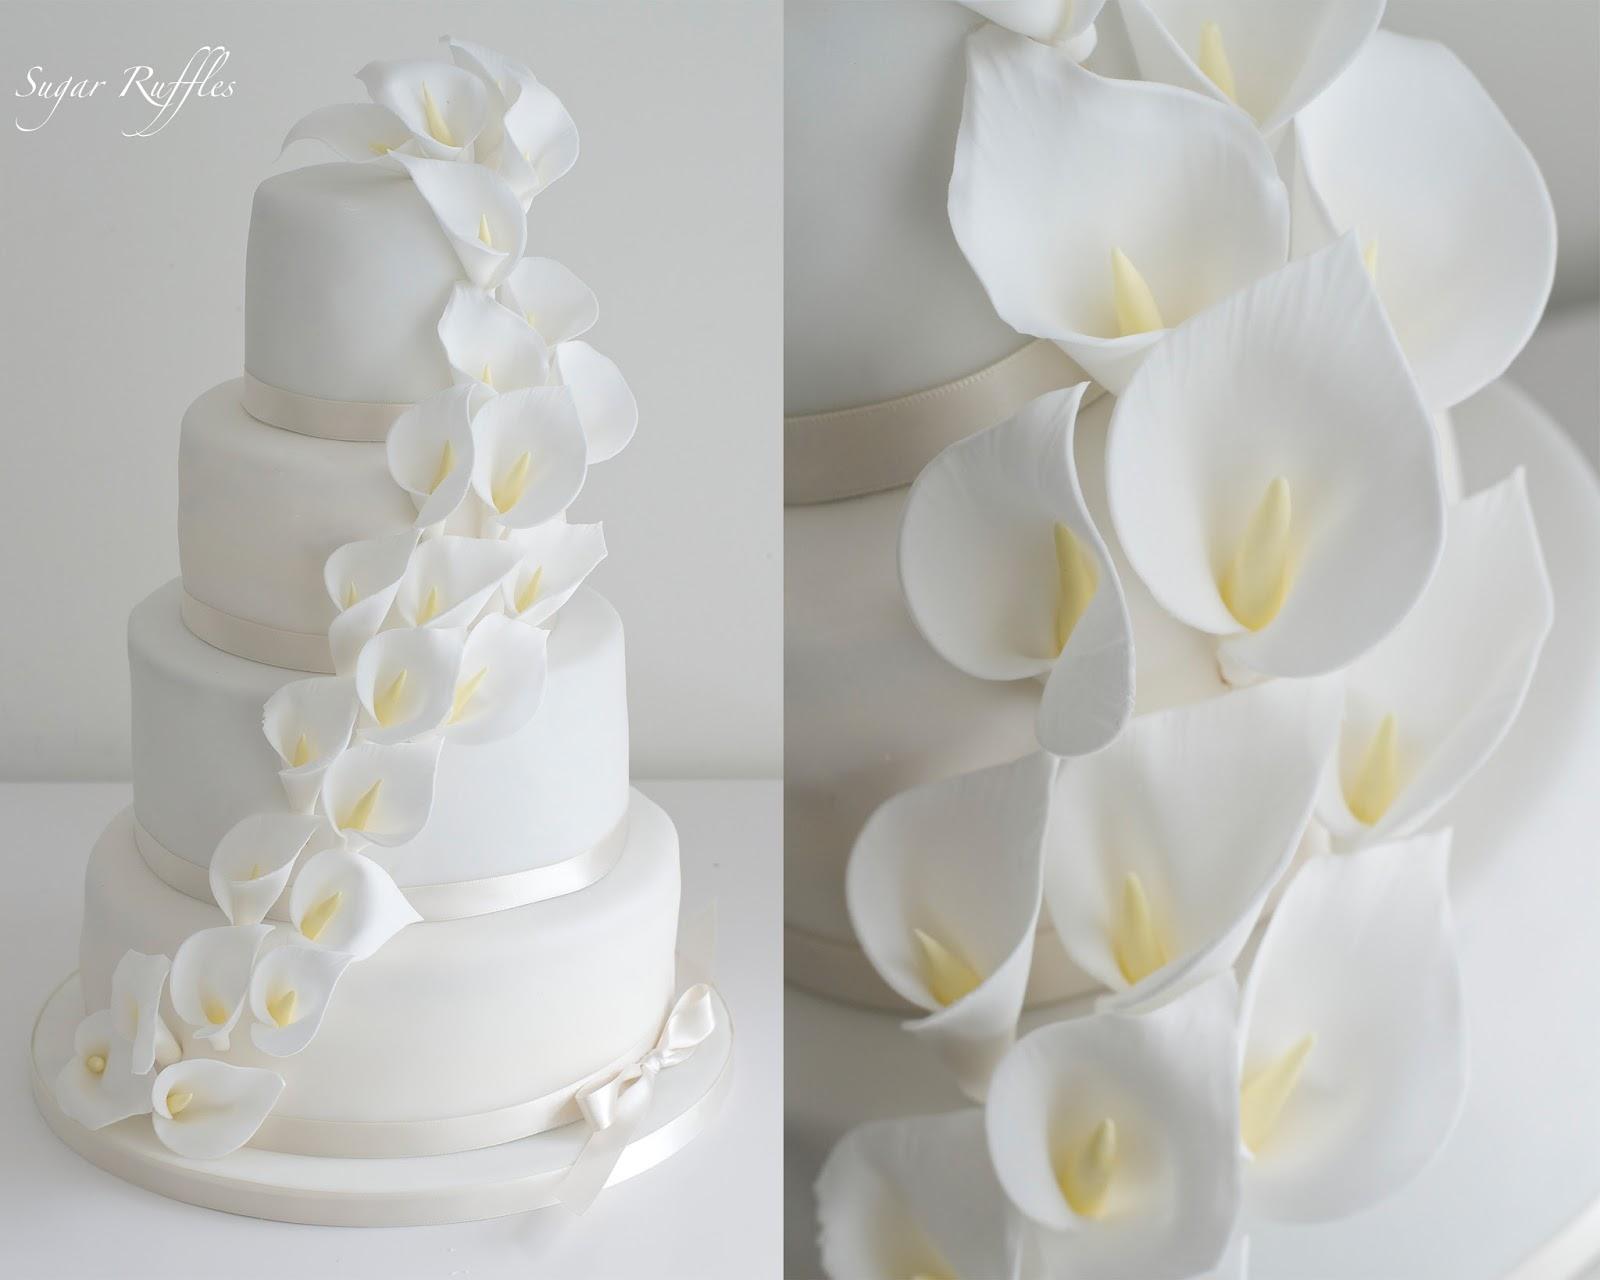 3 Tier Wedding Cakes 18 Stunning A tier wedding cake